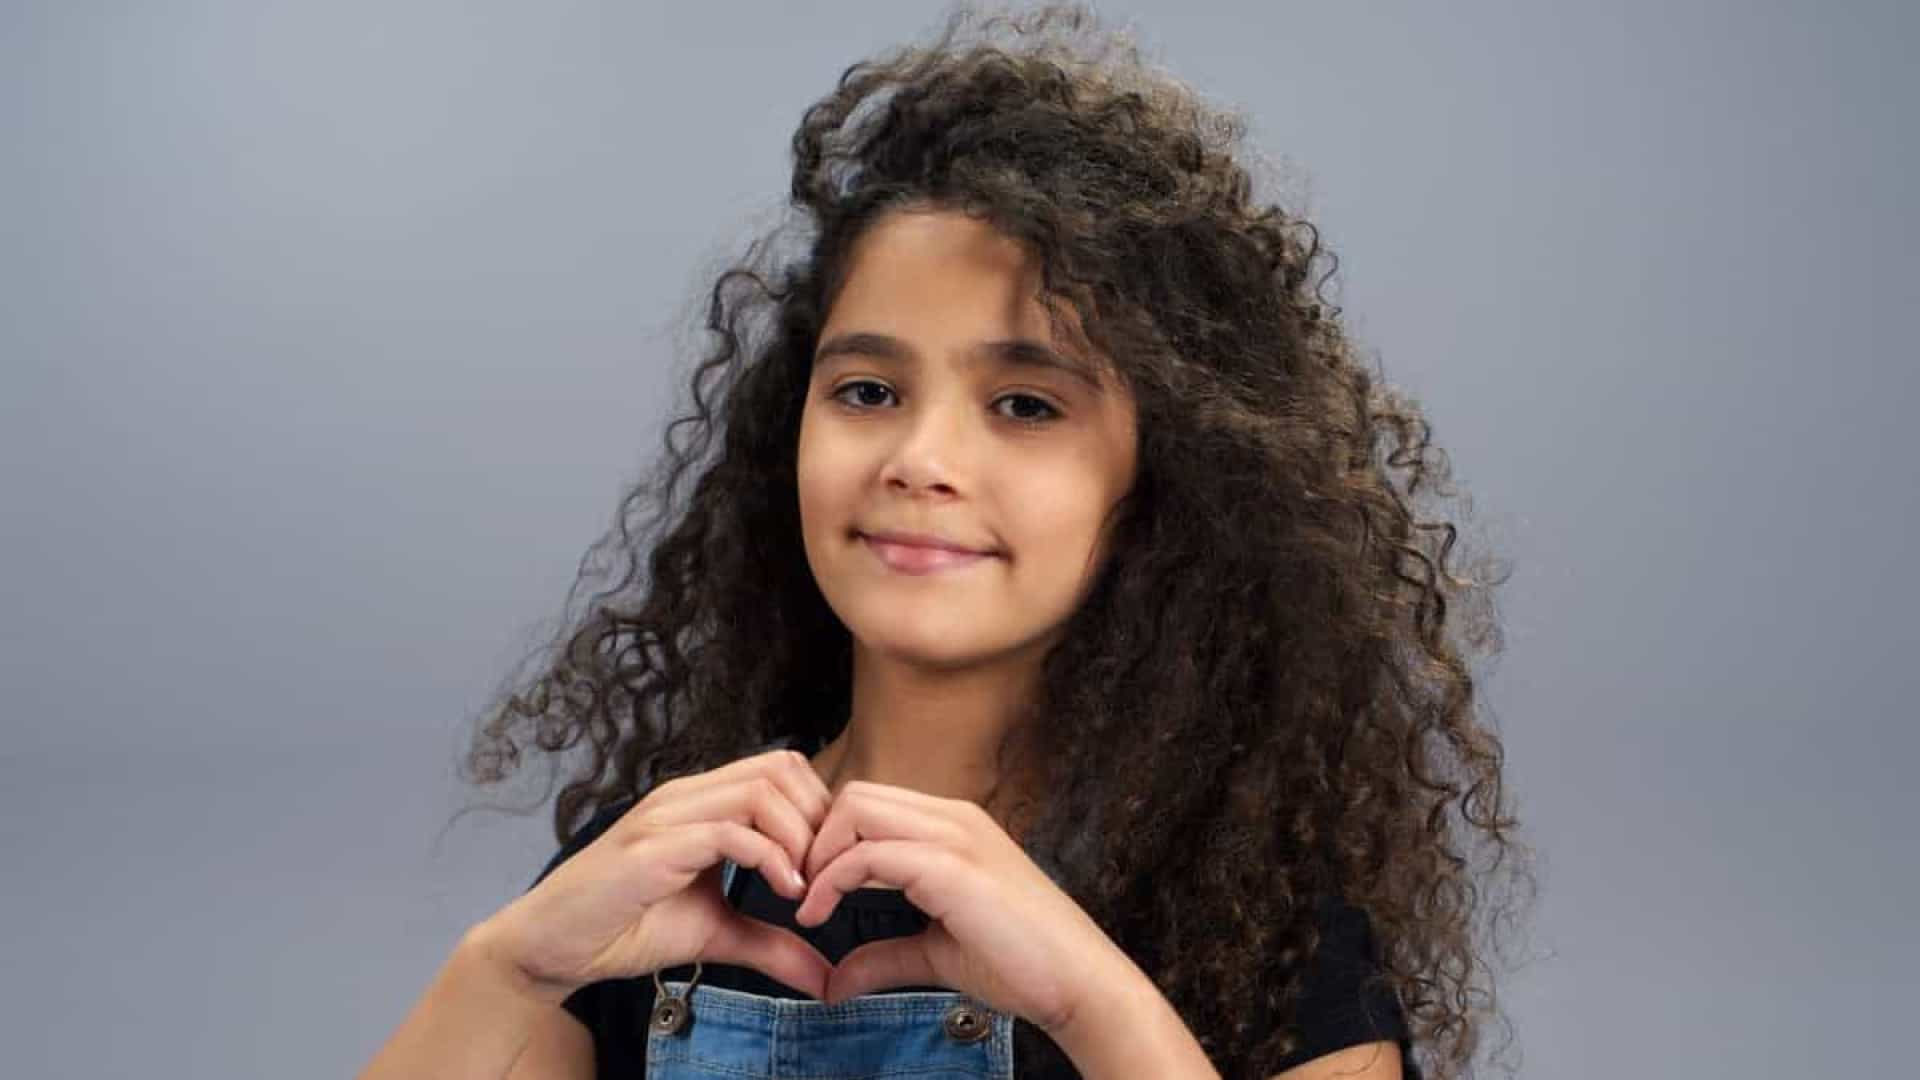 Filha de Mariah Carey estreia como modelo aos dez anos